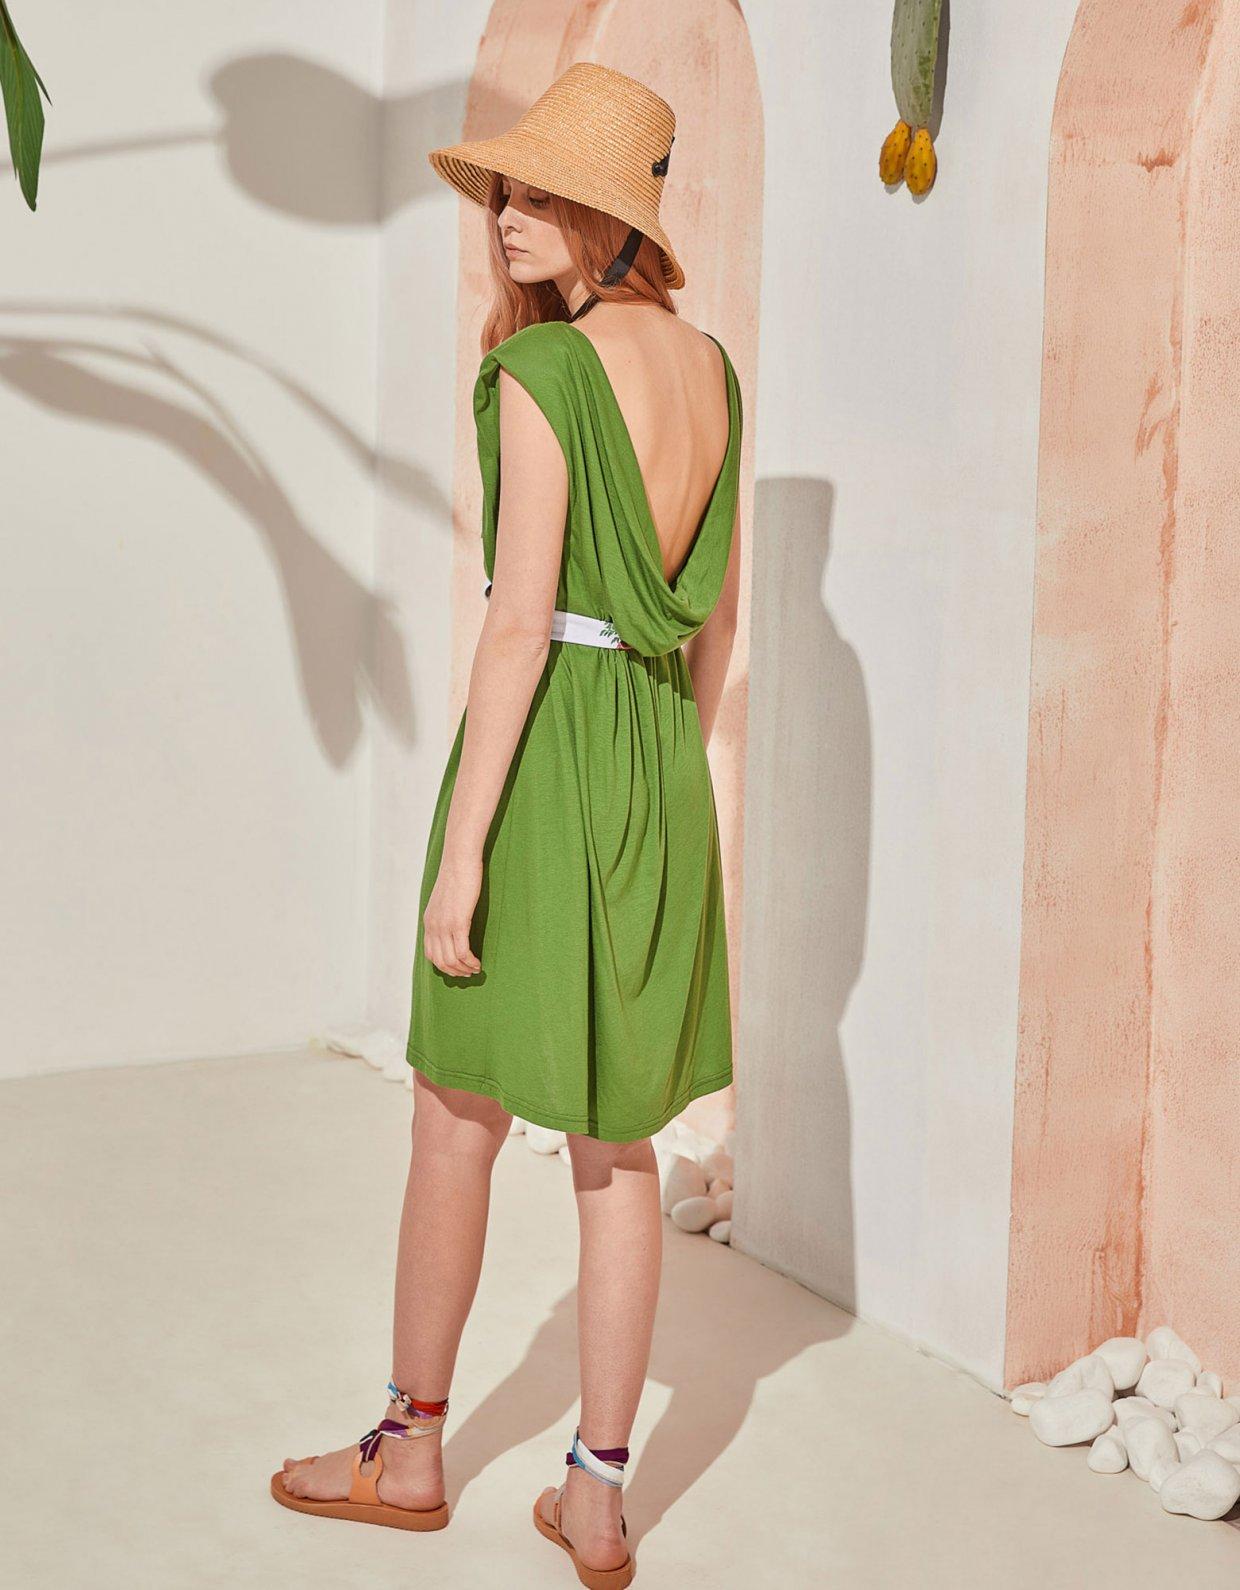 The Knl's Jaunt dress green